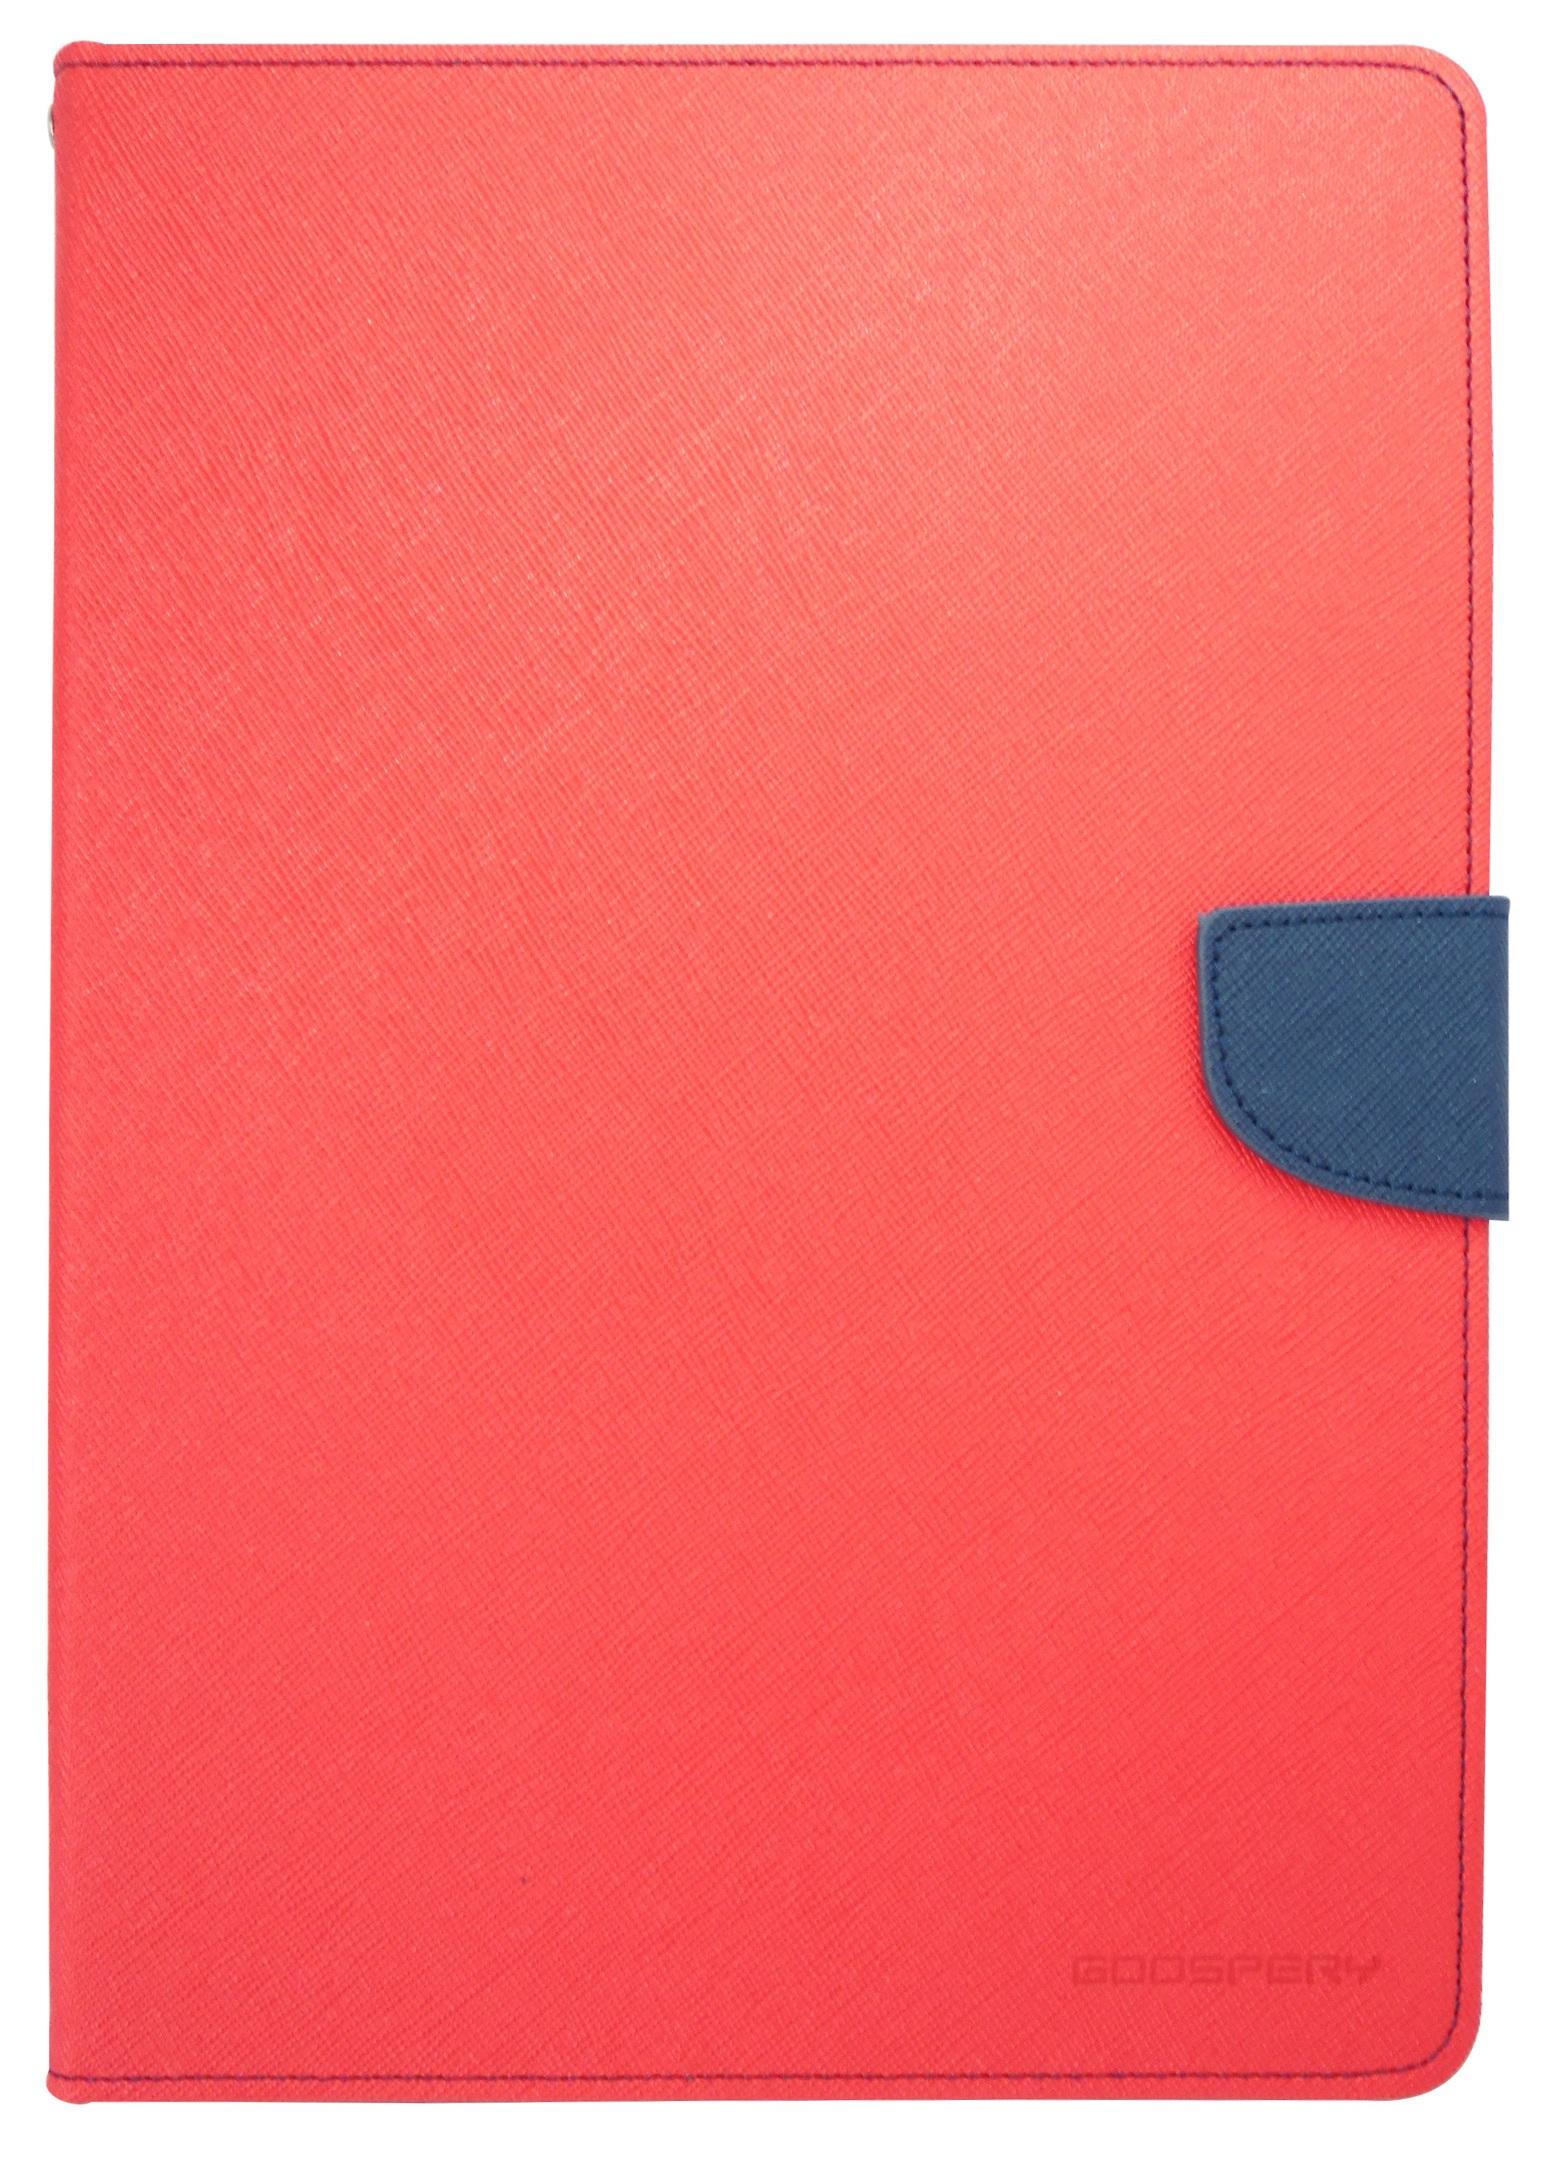 Husa tip carte Mercury Goospery Fancy Diary rosu + bleumarin pentru Samsung Galaxy Tab S2 9.7 T810 / T815 (3G/LTE)